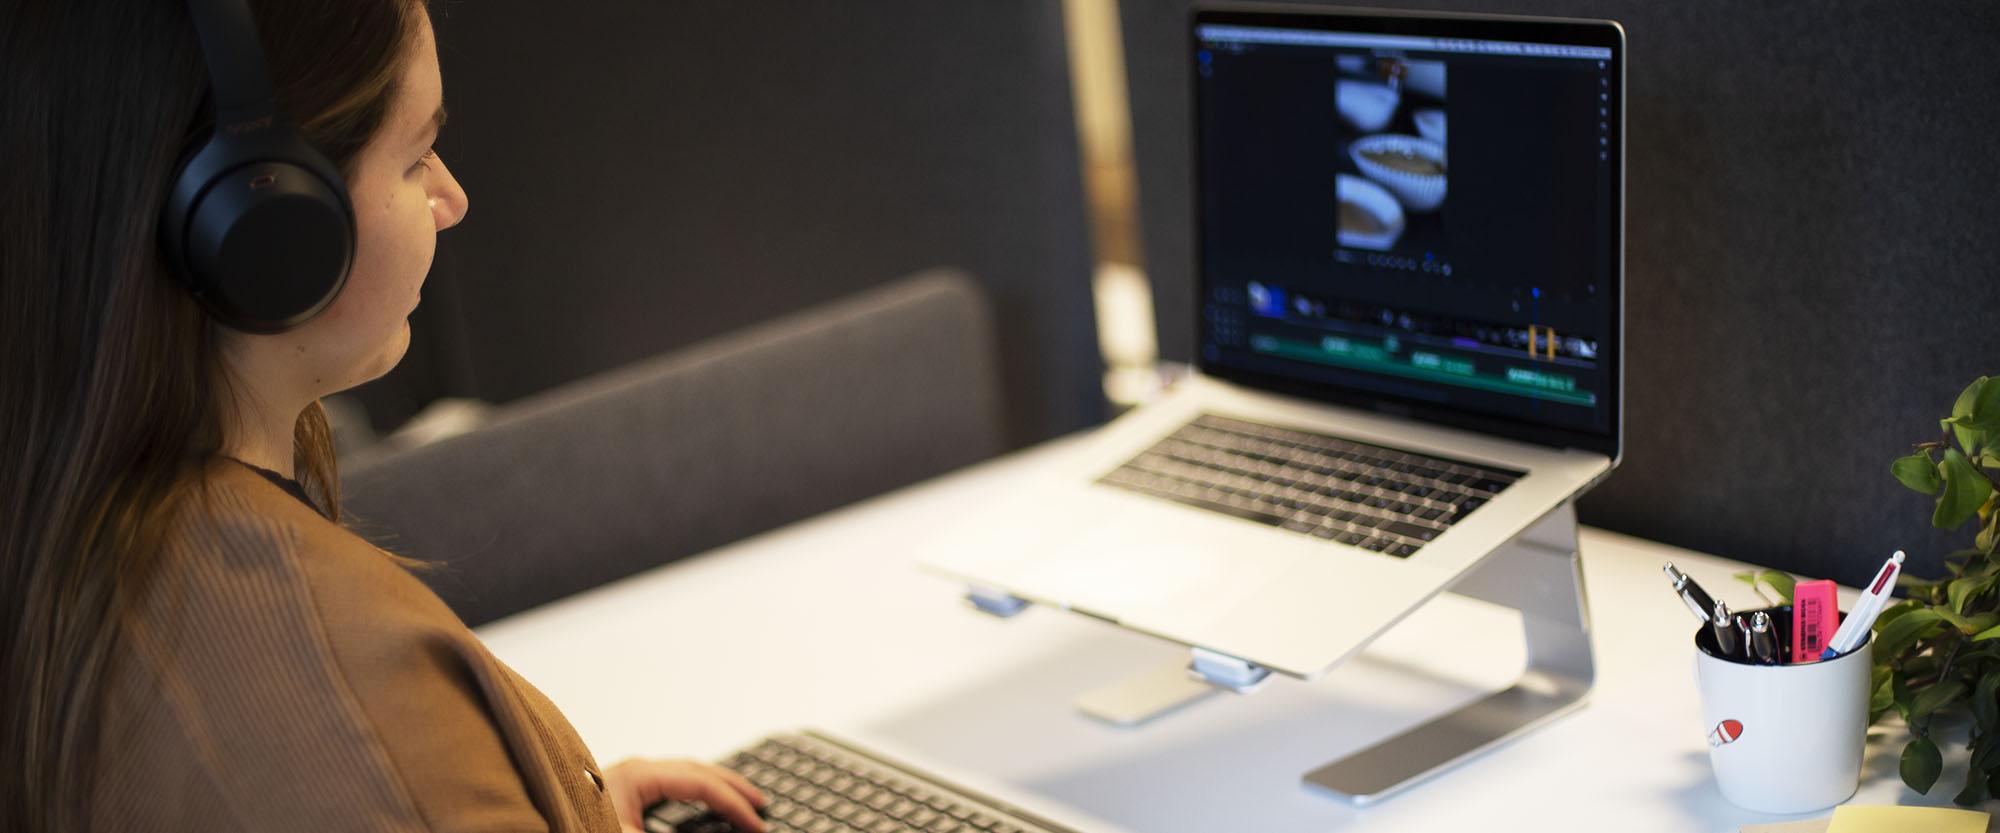 Onlinekurs Videoredigera med Premiere Rush